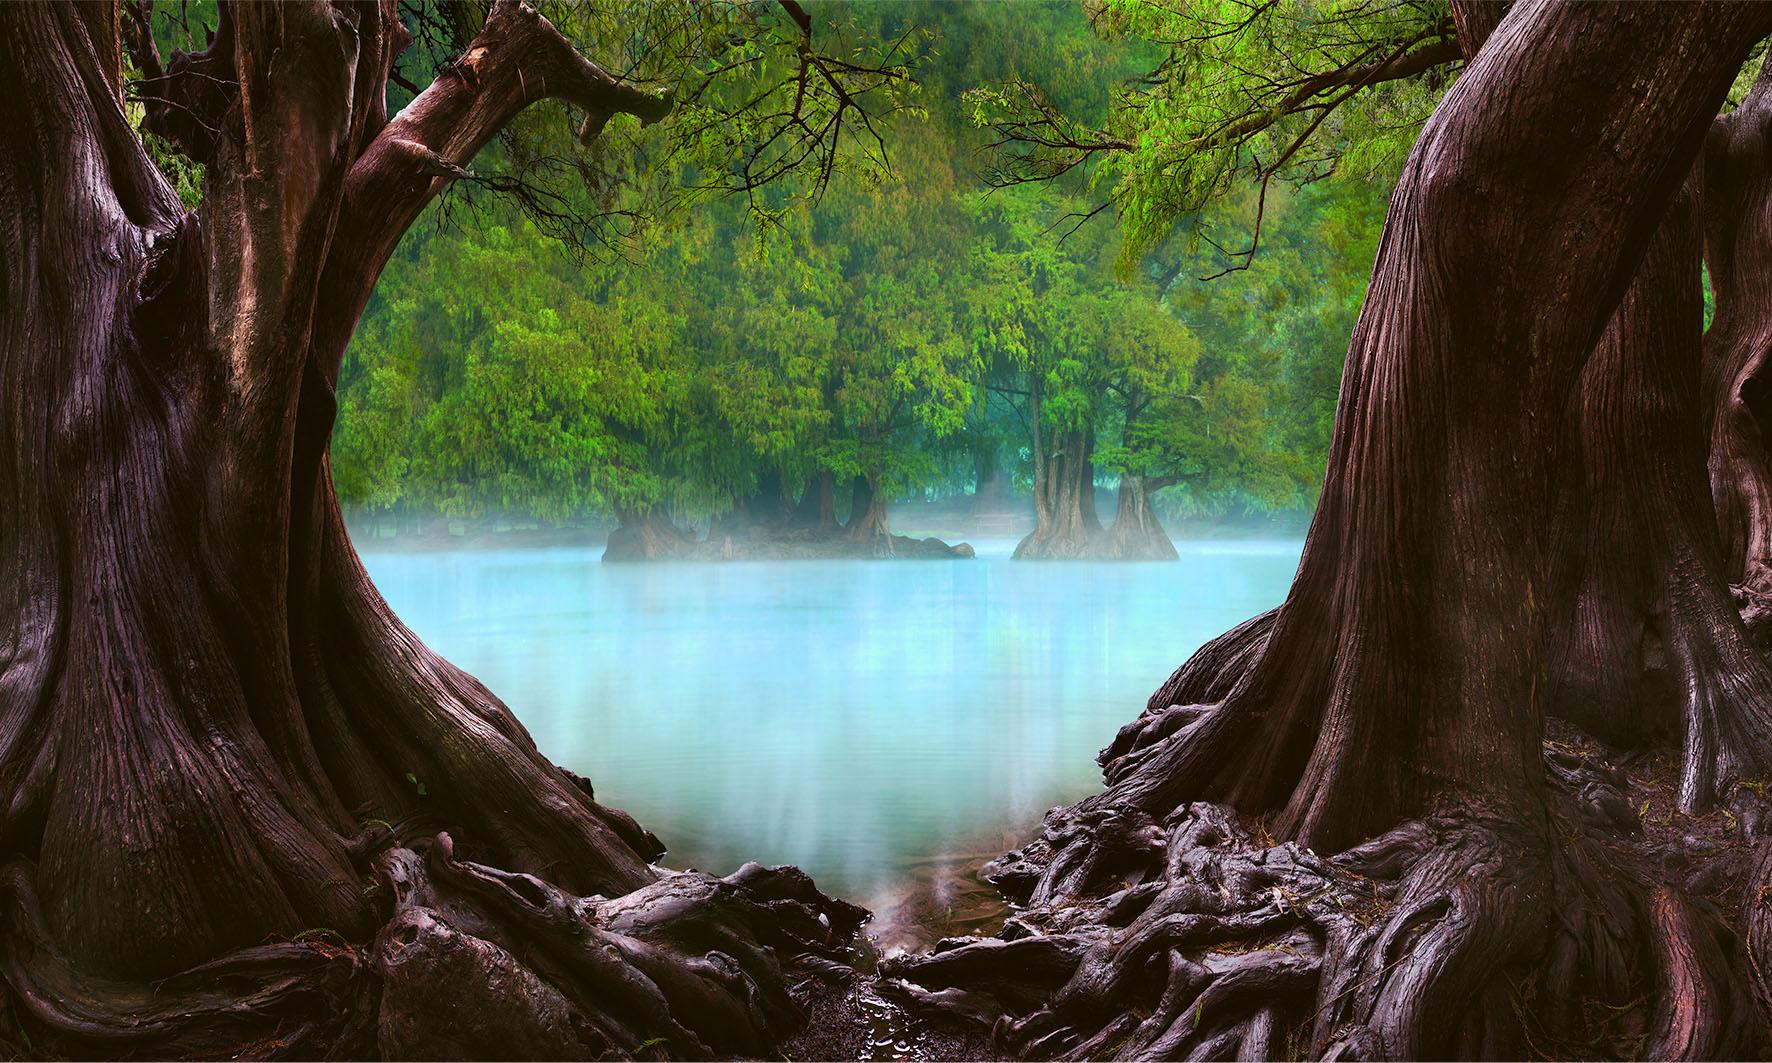 Pepe Soho - Mistic Lake